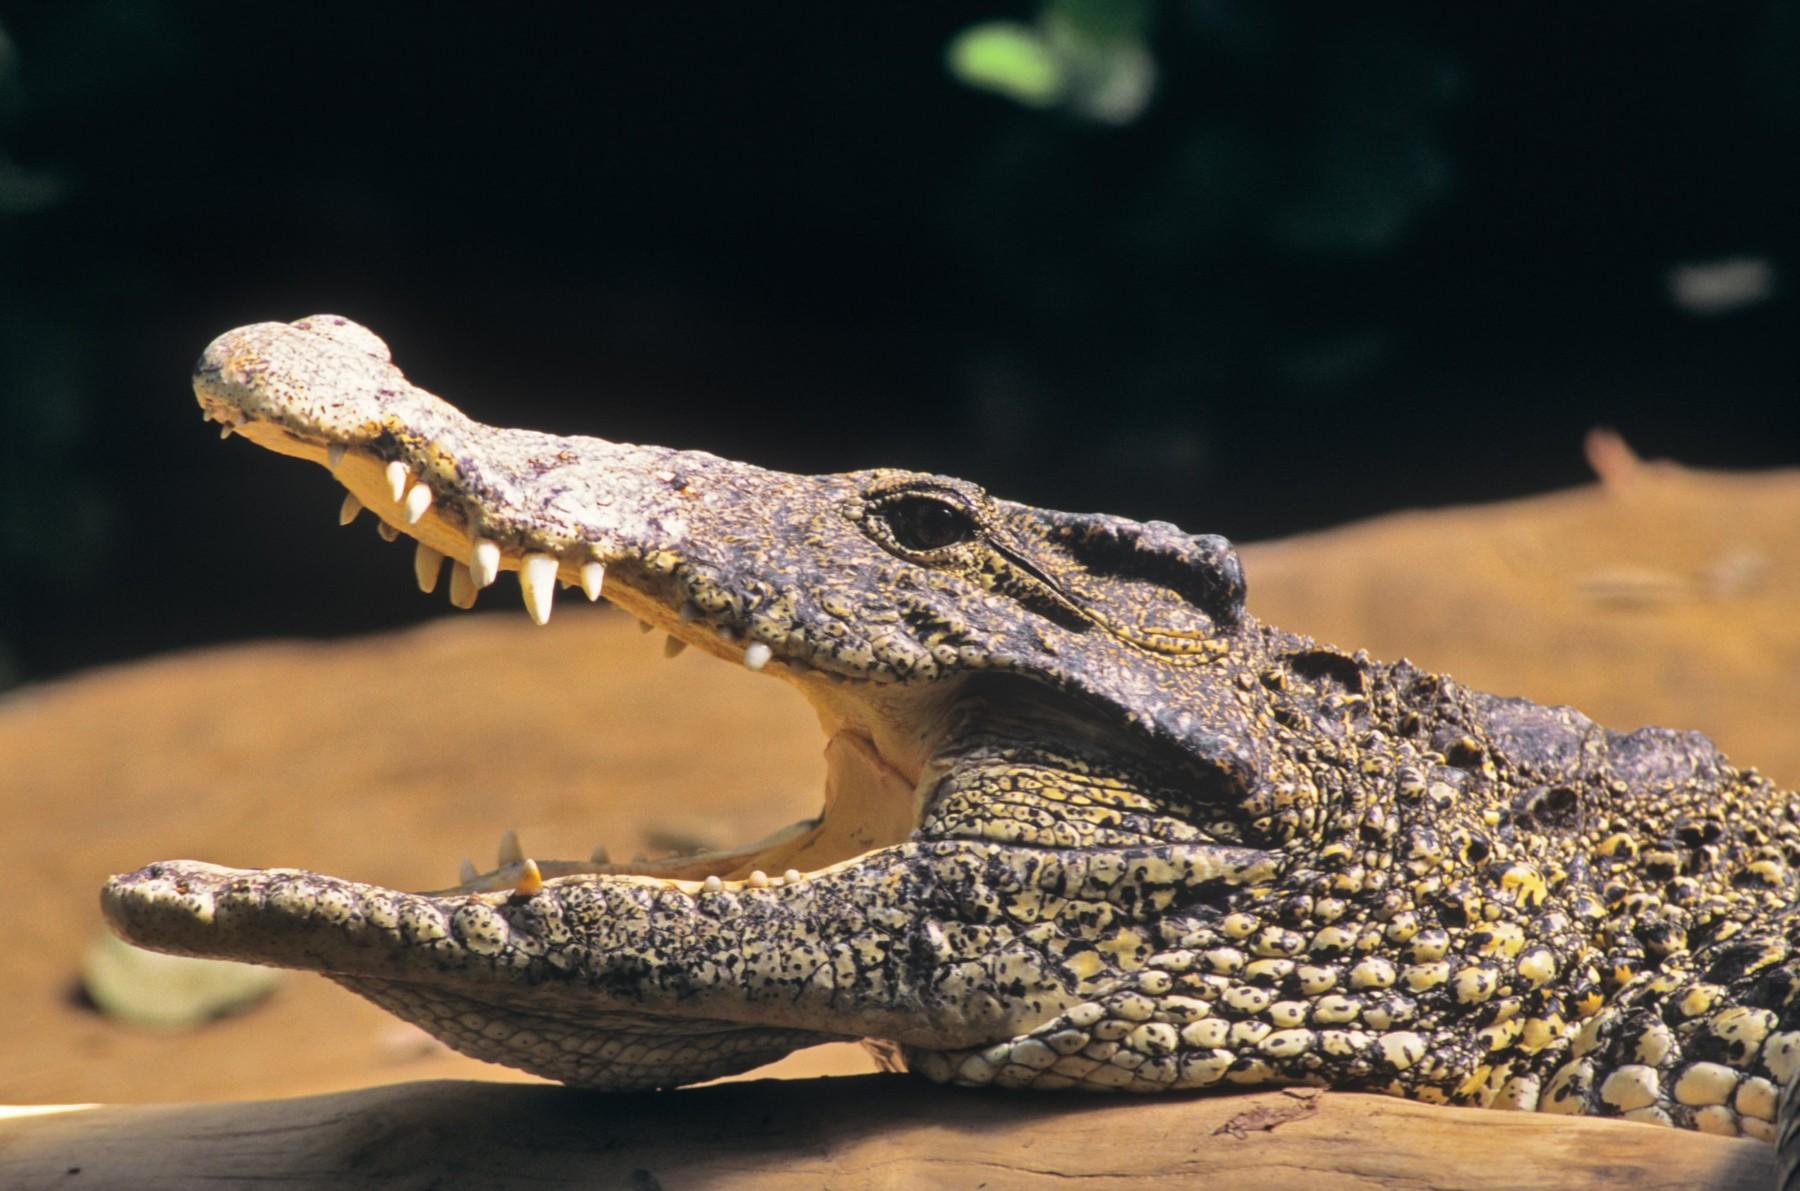 kubanski krokodil